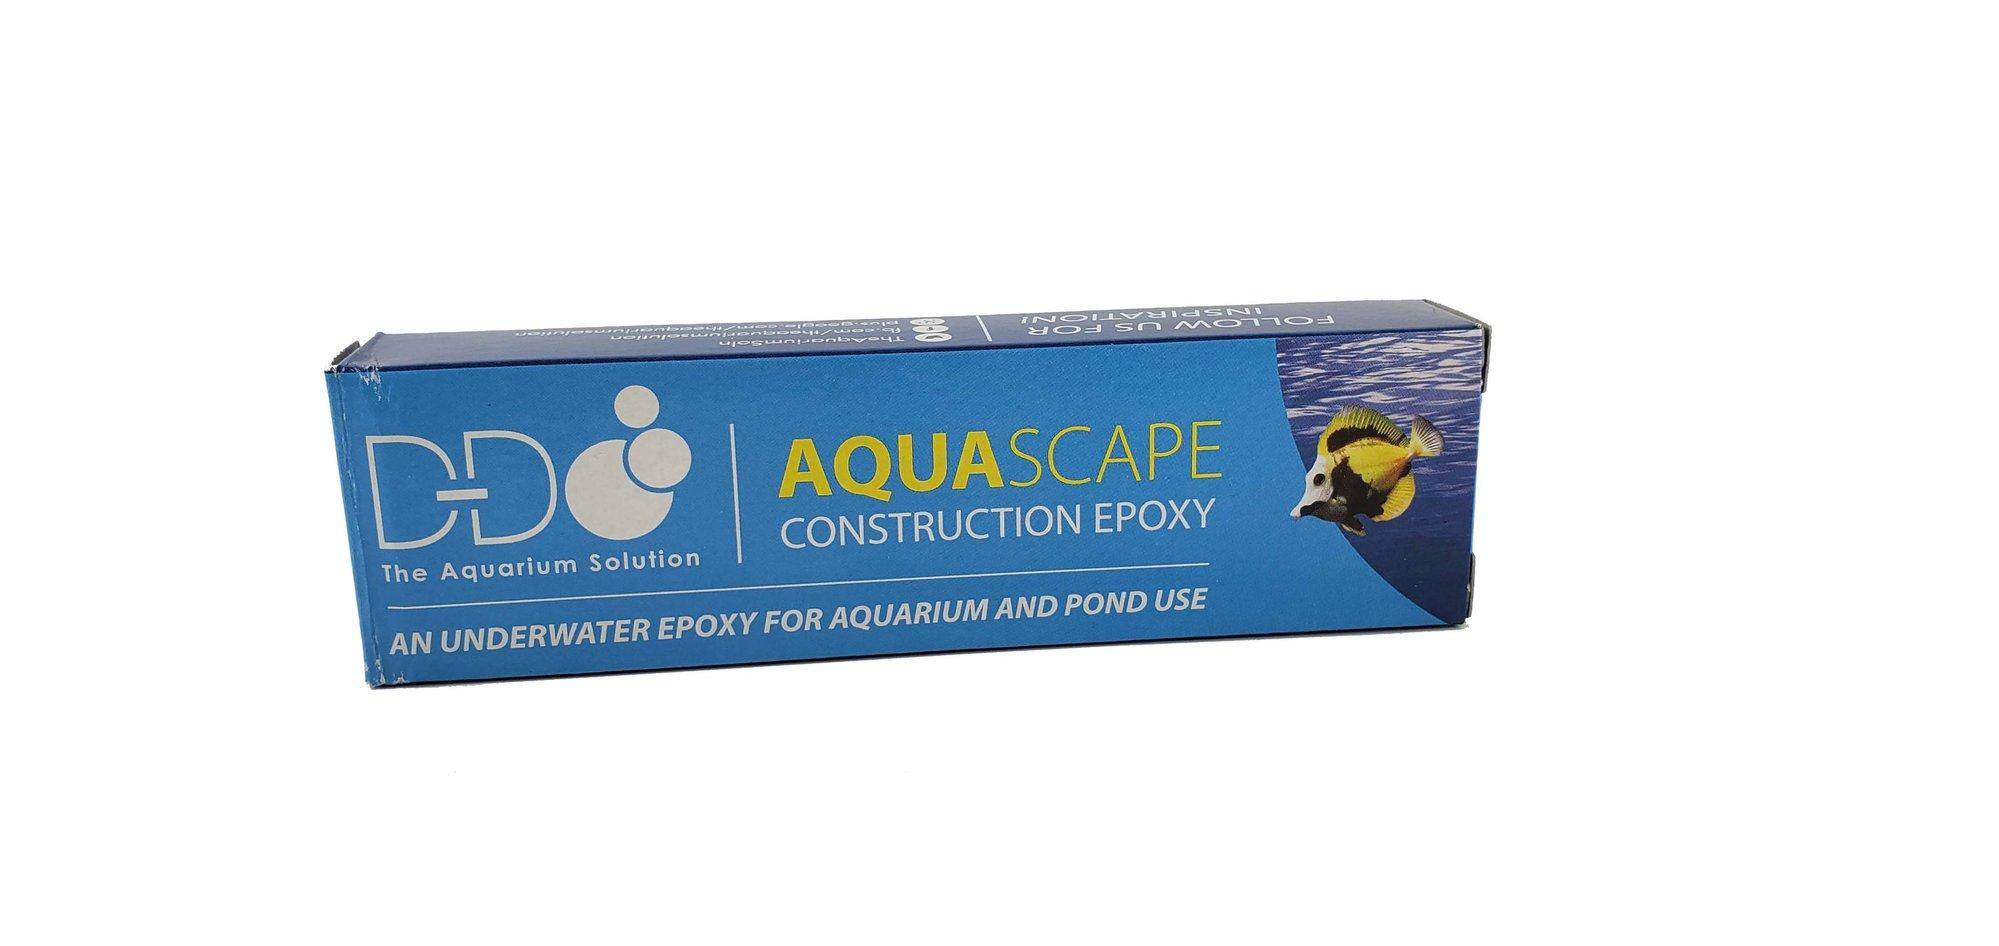 Dd Aquascape Construction Epoxy - Massa Para Rochas E Corais